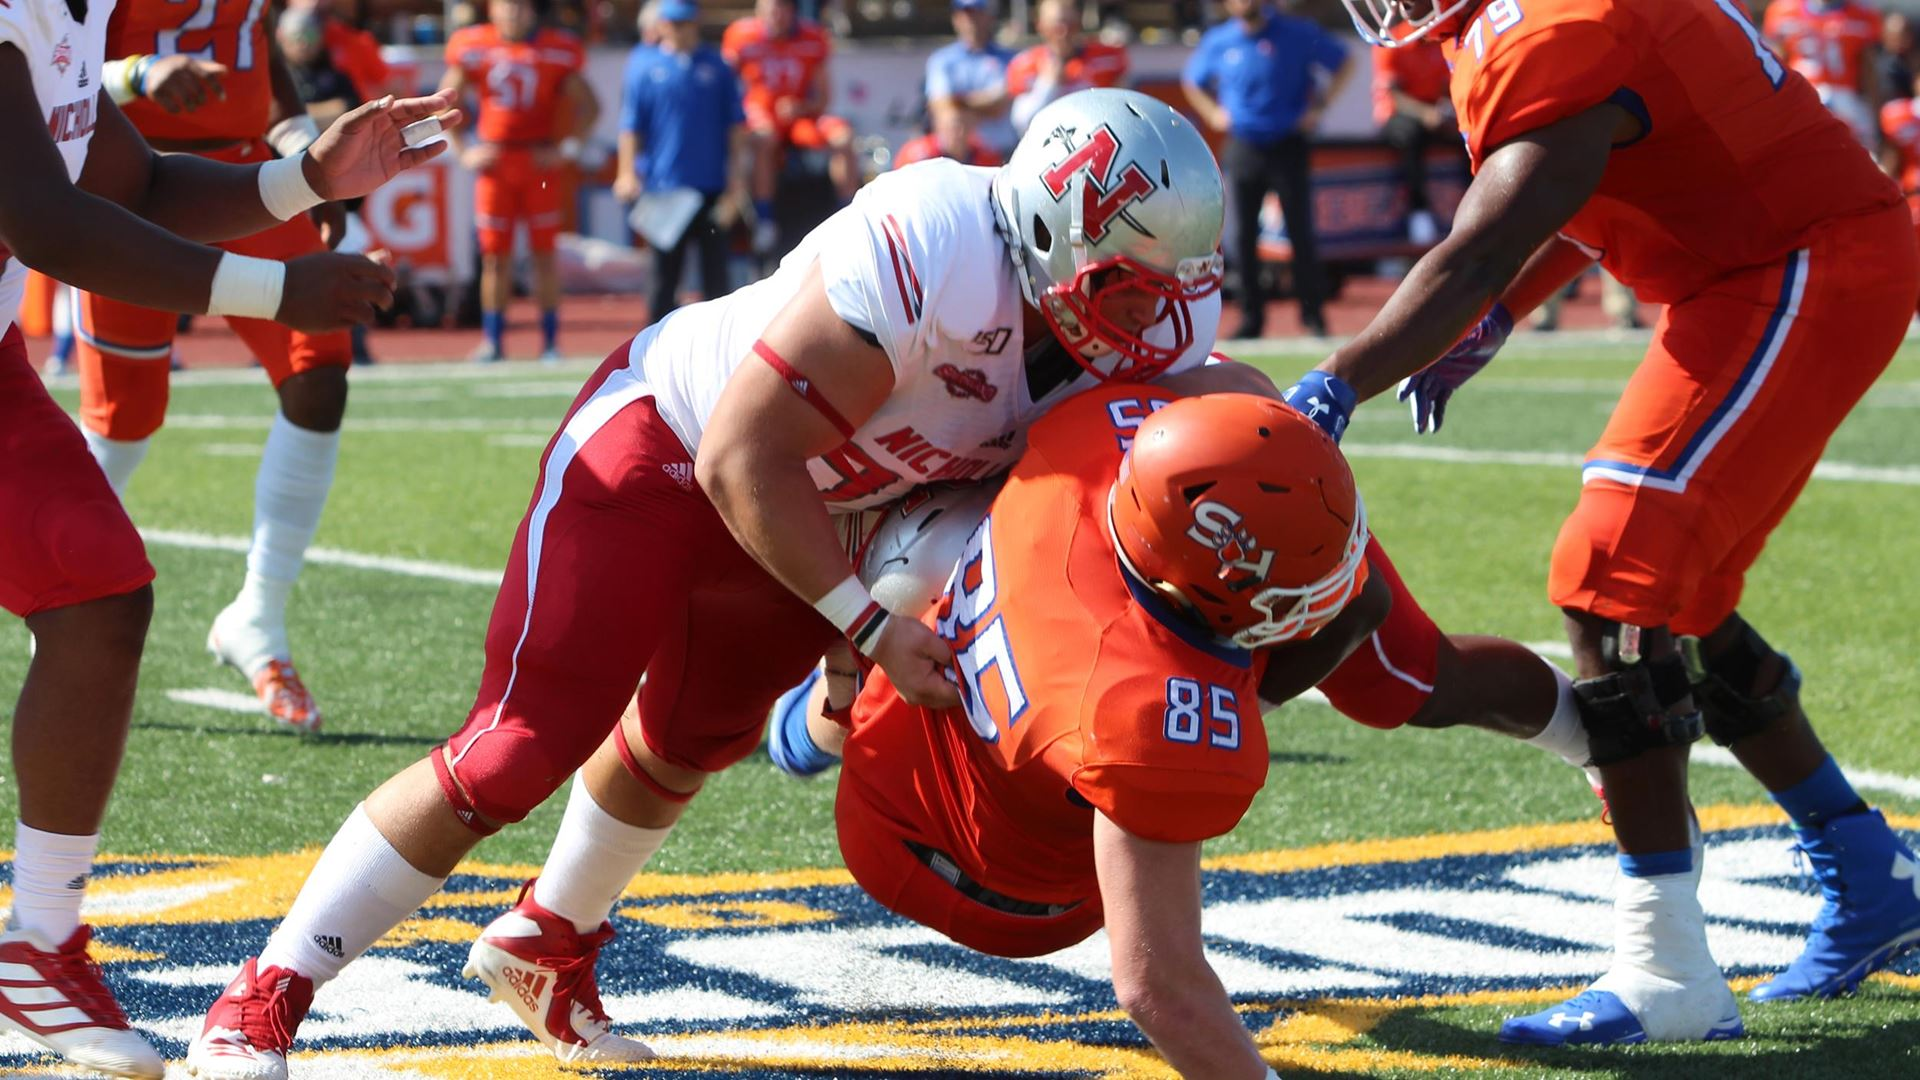 FCS College Football's 5 Must-See Games in Week 5